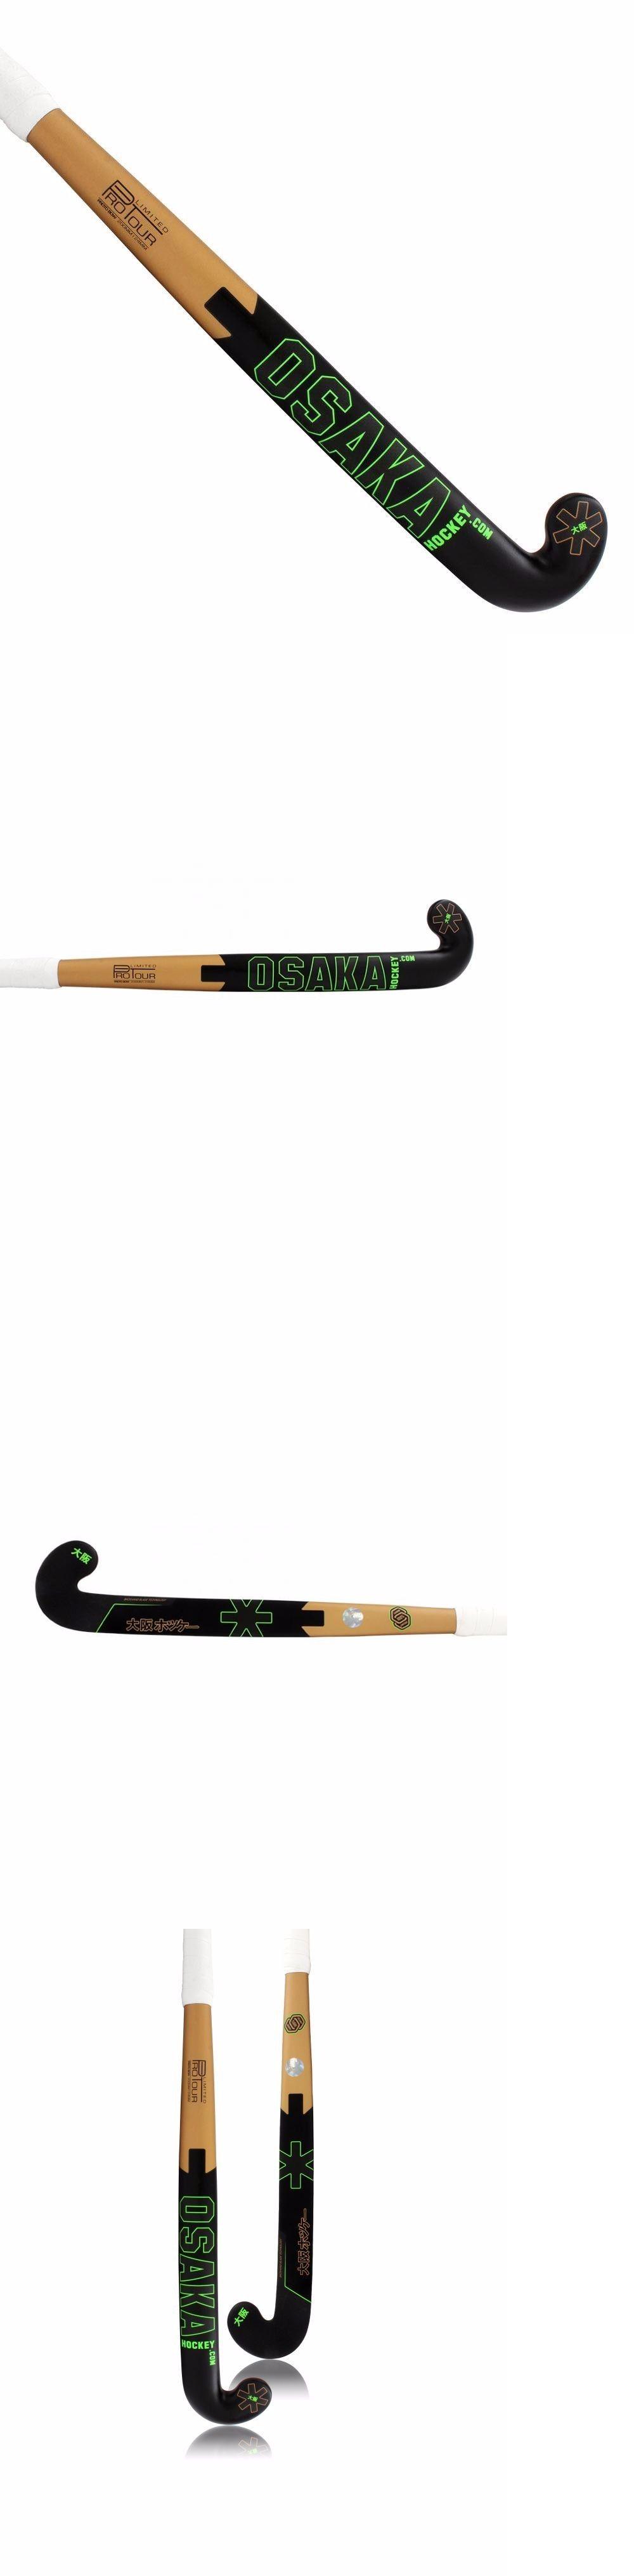 Osaka Pro Tour LTD ProtoBow Composite Field Hockey Stick free grip /& bag 37.5